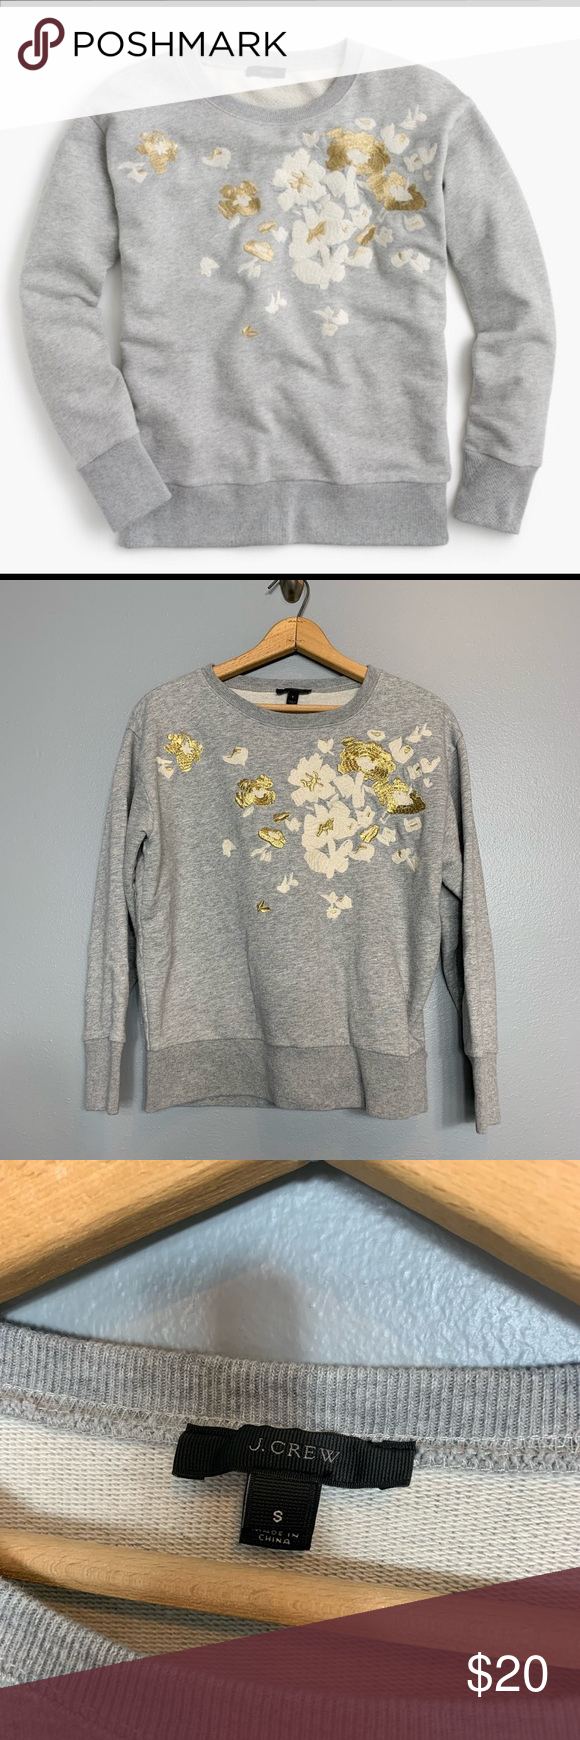 J Crew Terry Floral Embroidered Sweatshirt Embroidered Sweatshirts Dressy Sweatshirt Sweatshirts [ 1740 x 580 Pixel ]